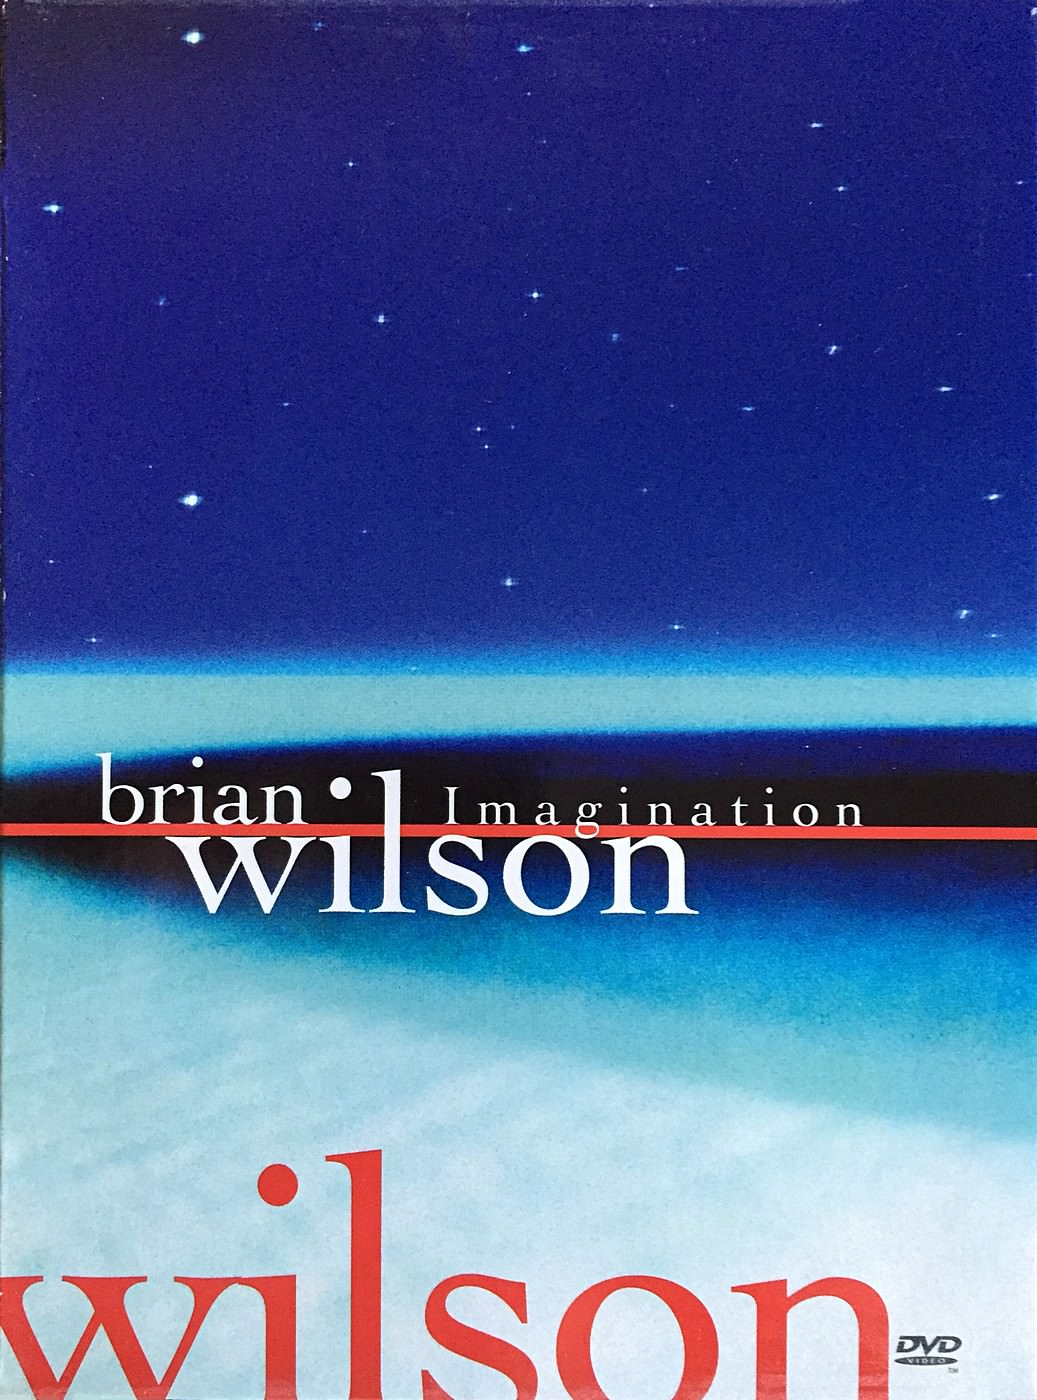 Imagination cover